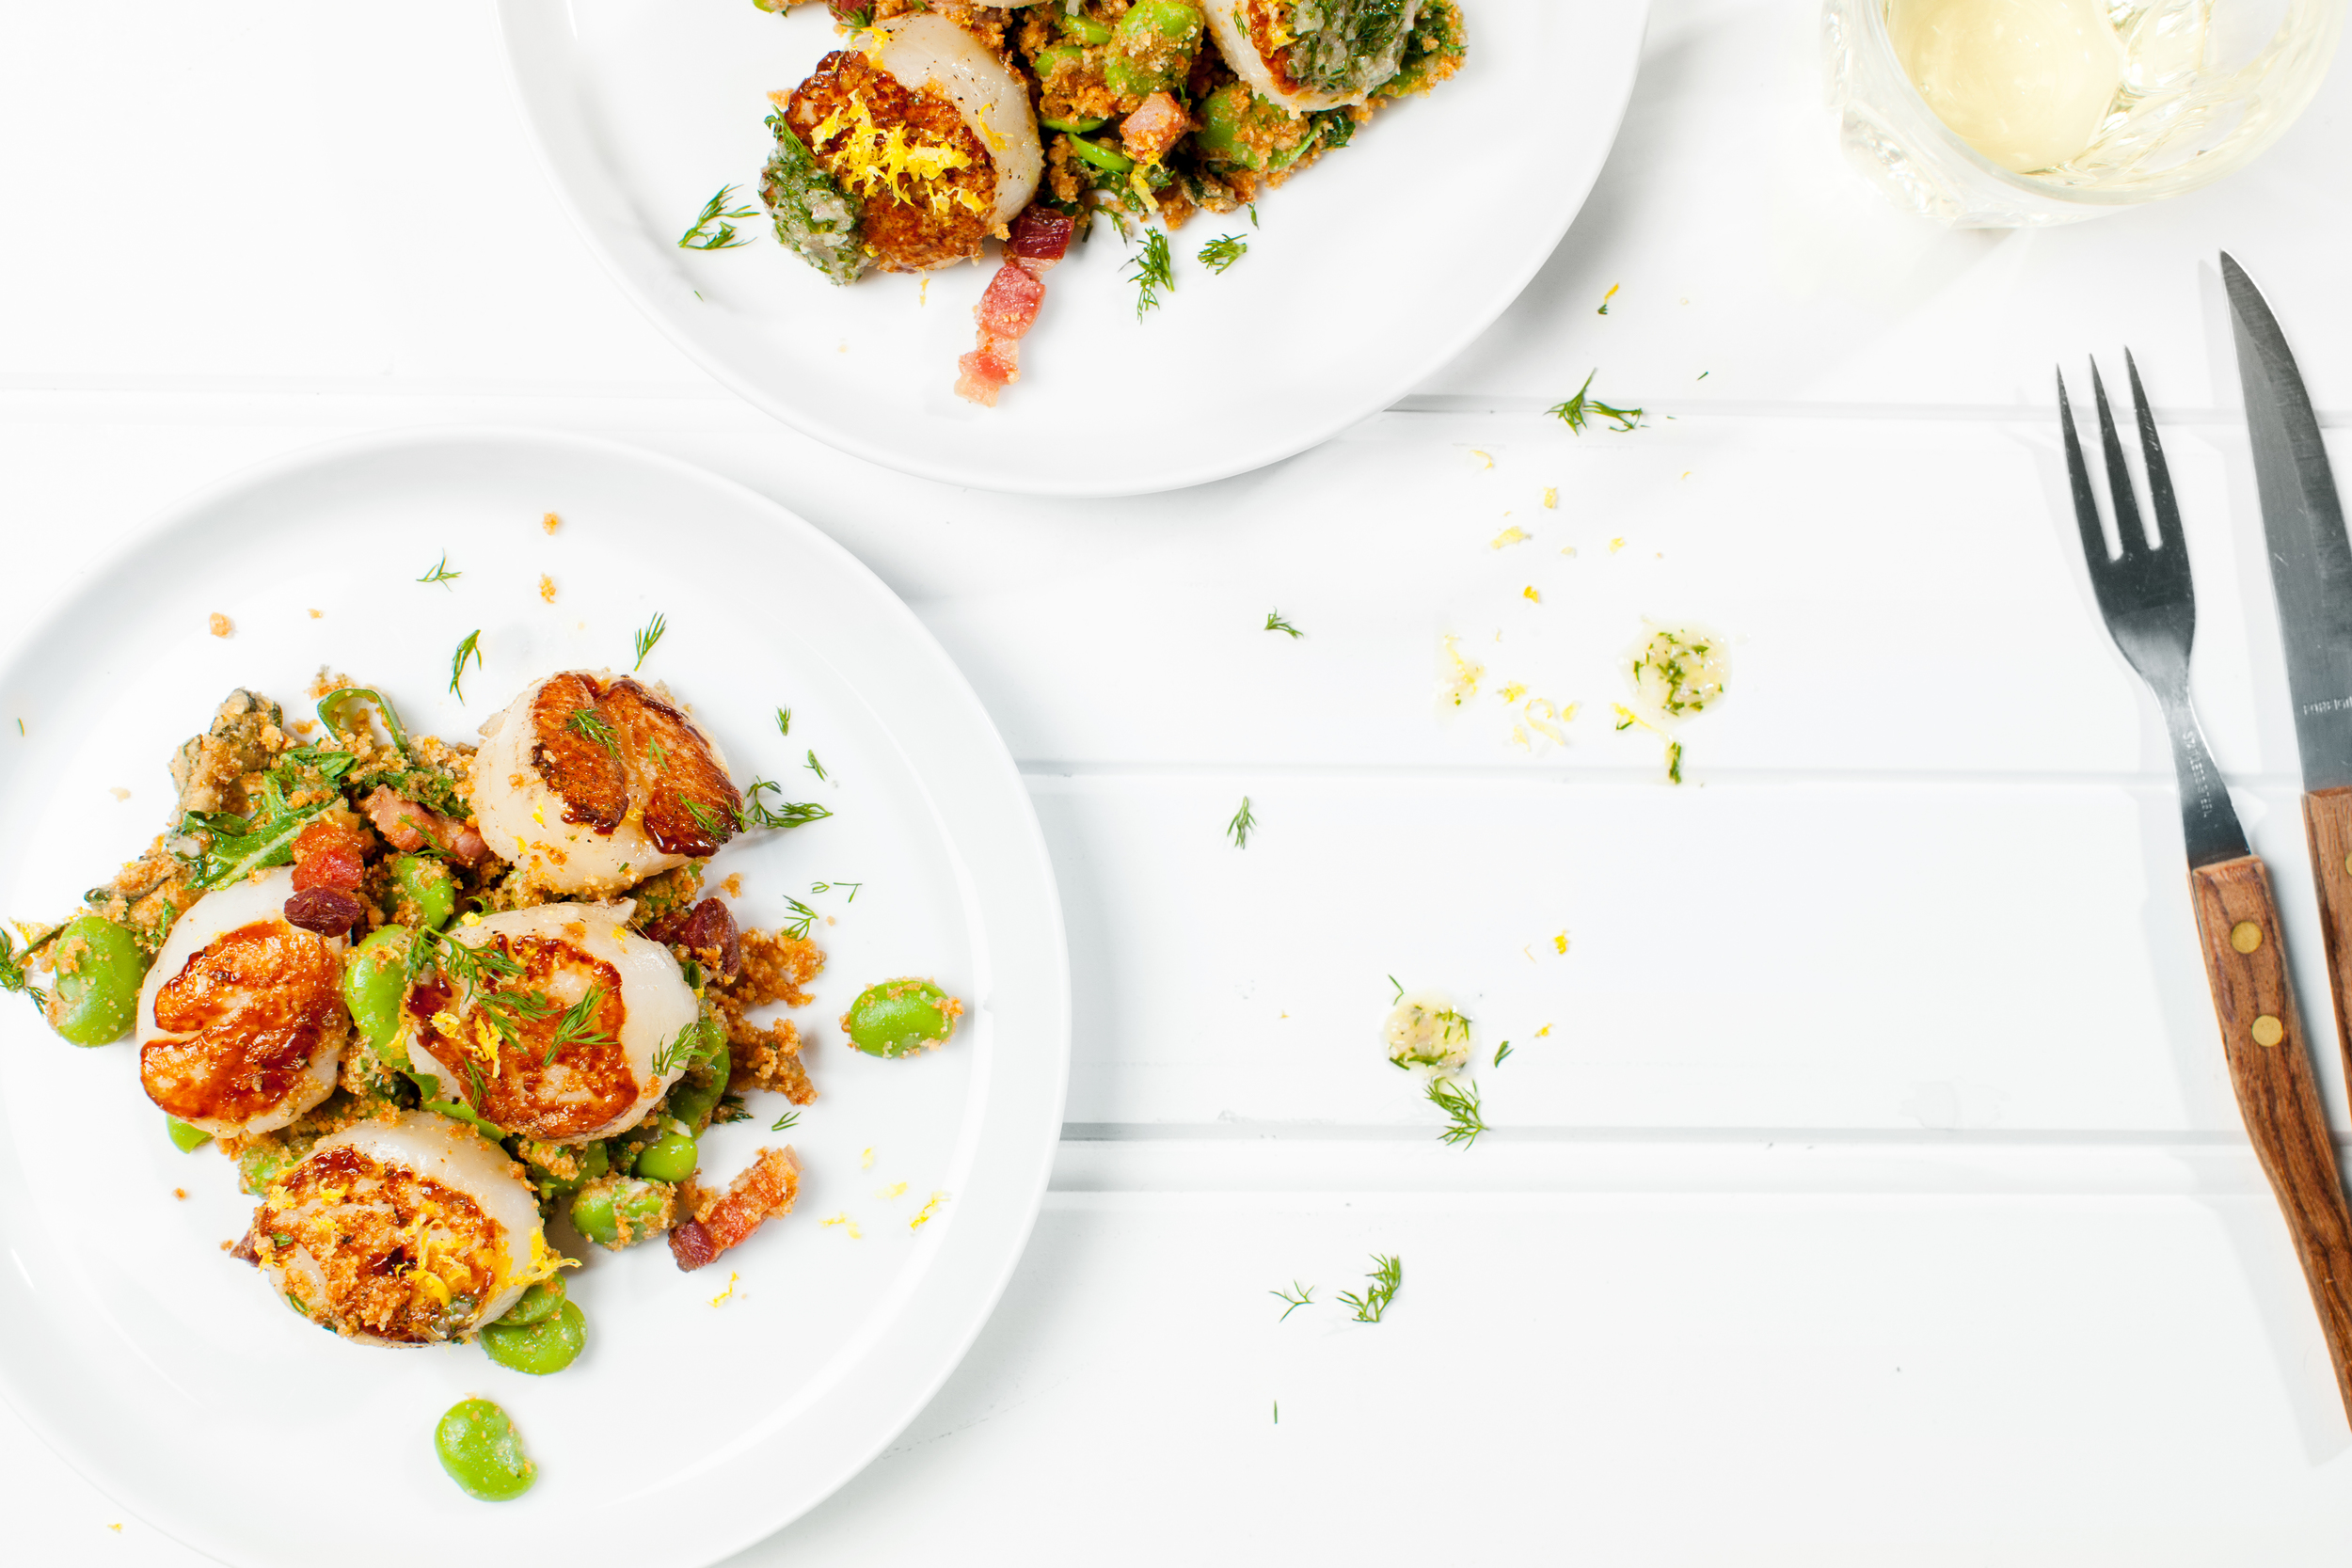 GrilledScallopsw Almond, Pancetta& BroadBeanSalad. Recipe and styling by  Cle-ann  , photo by  Hugh Adams  .